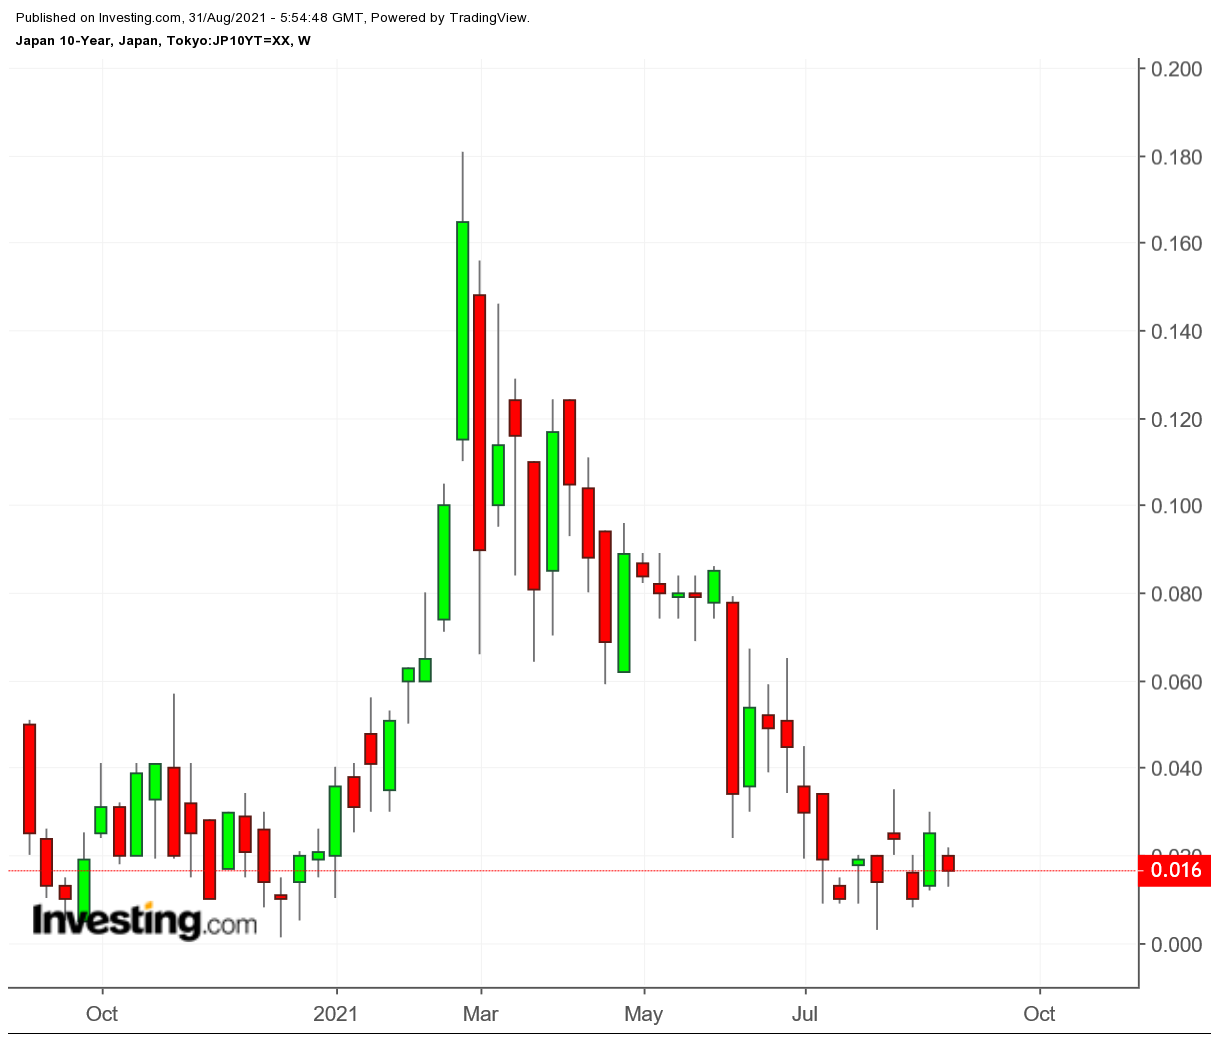 Japan 10-year Treasury Weekly Chart